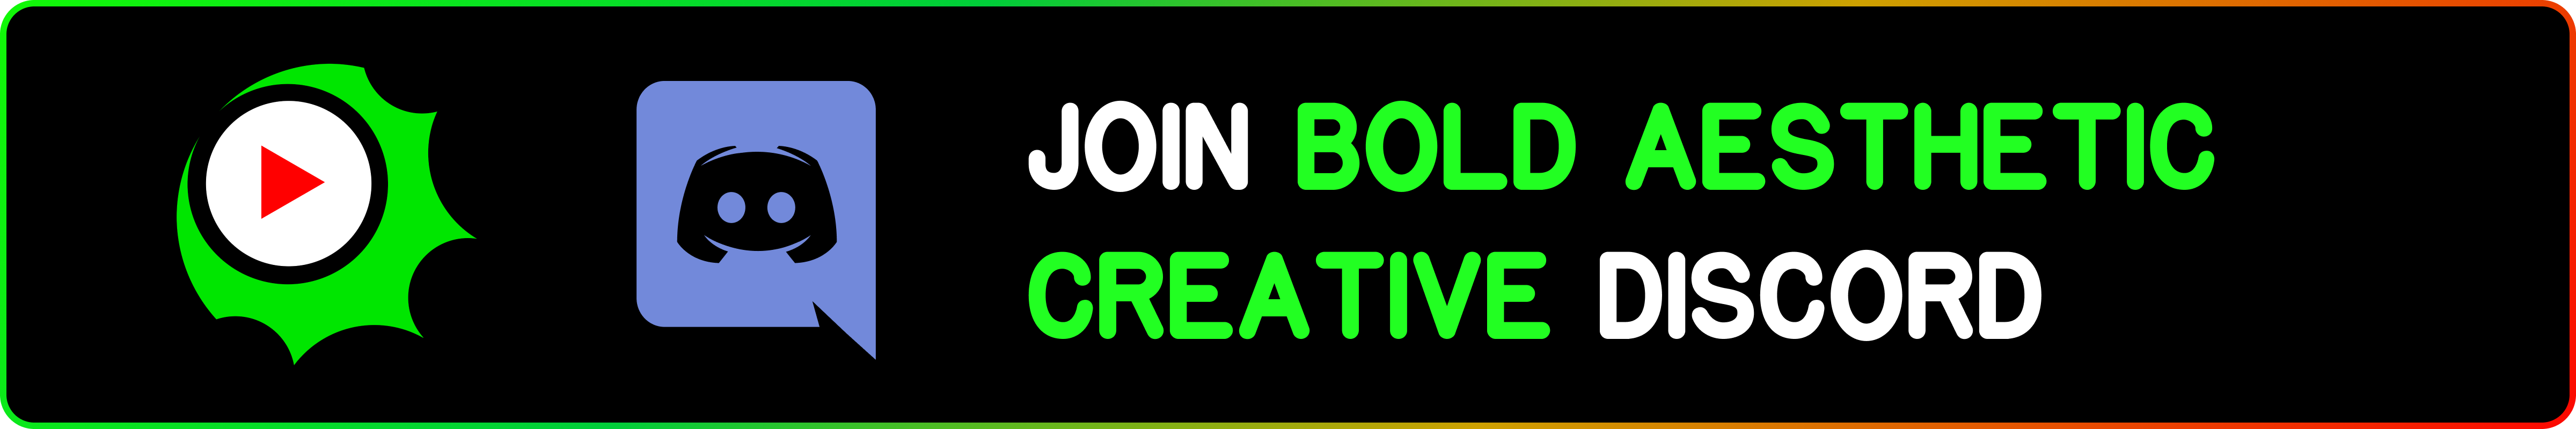 Bold Aesthetic Creative Discord